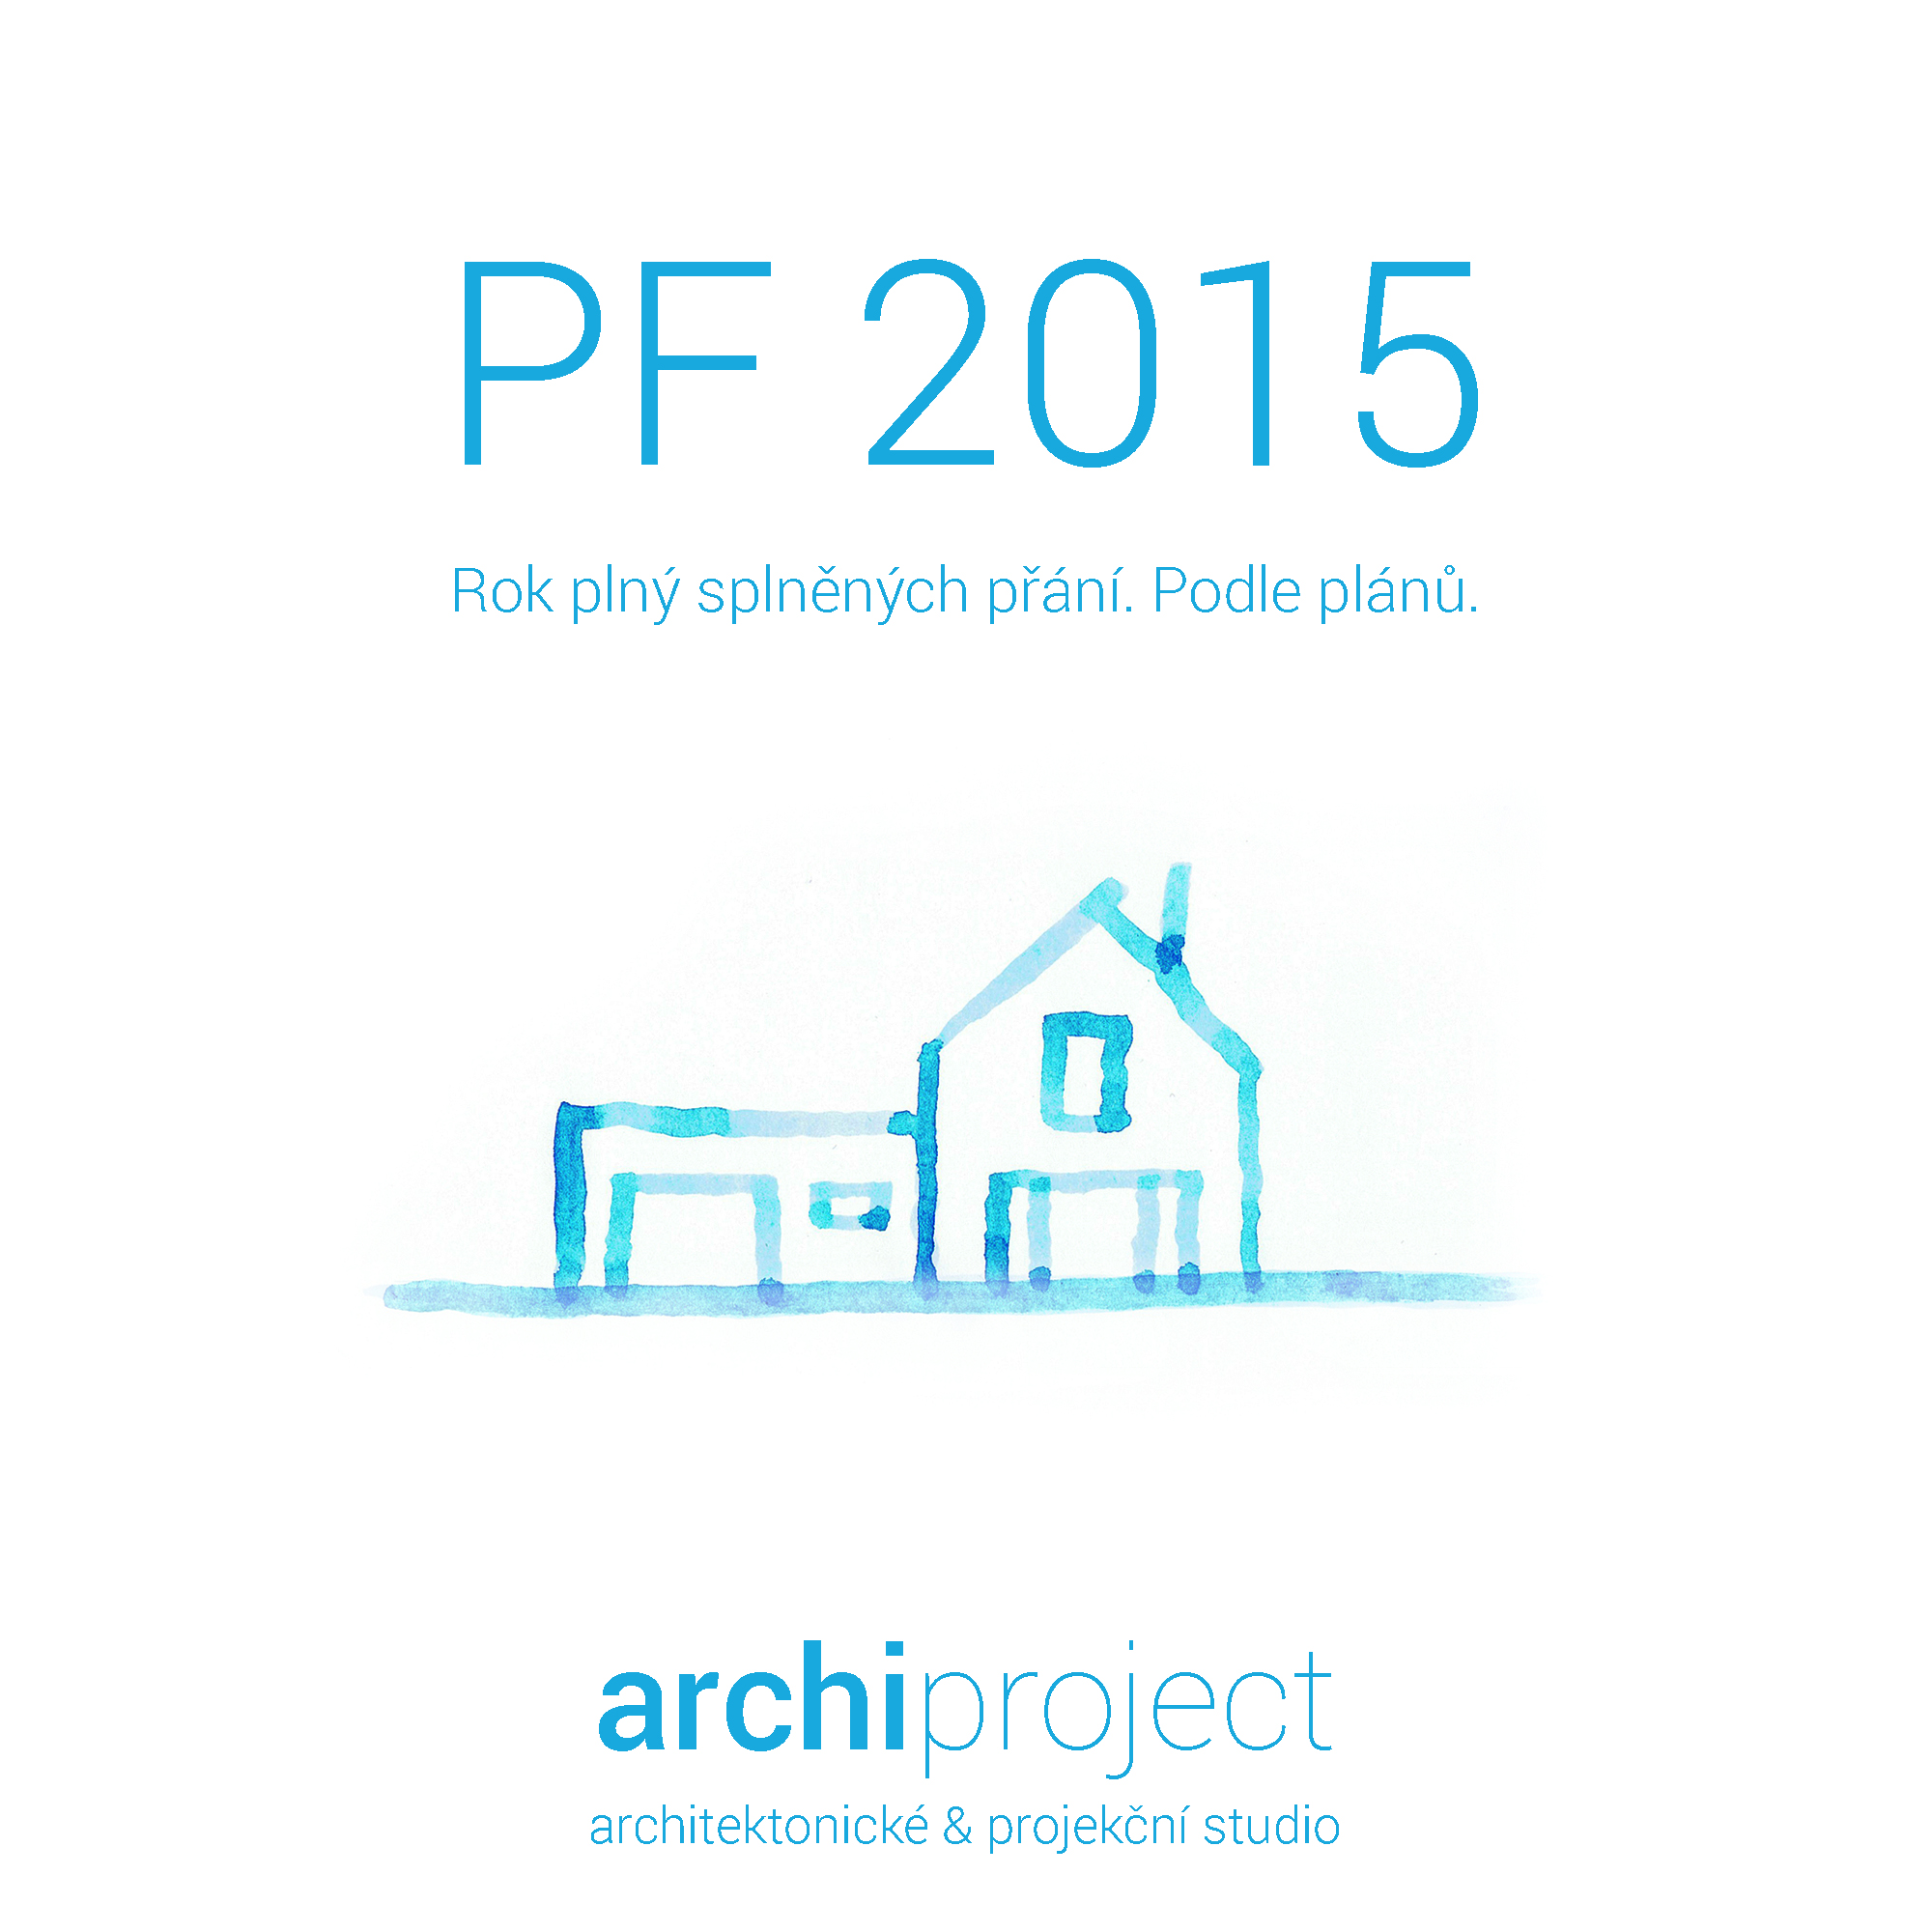 pf2015 2